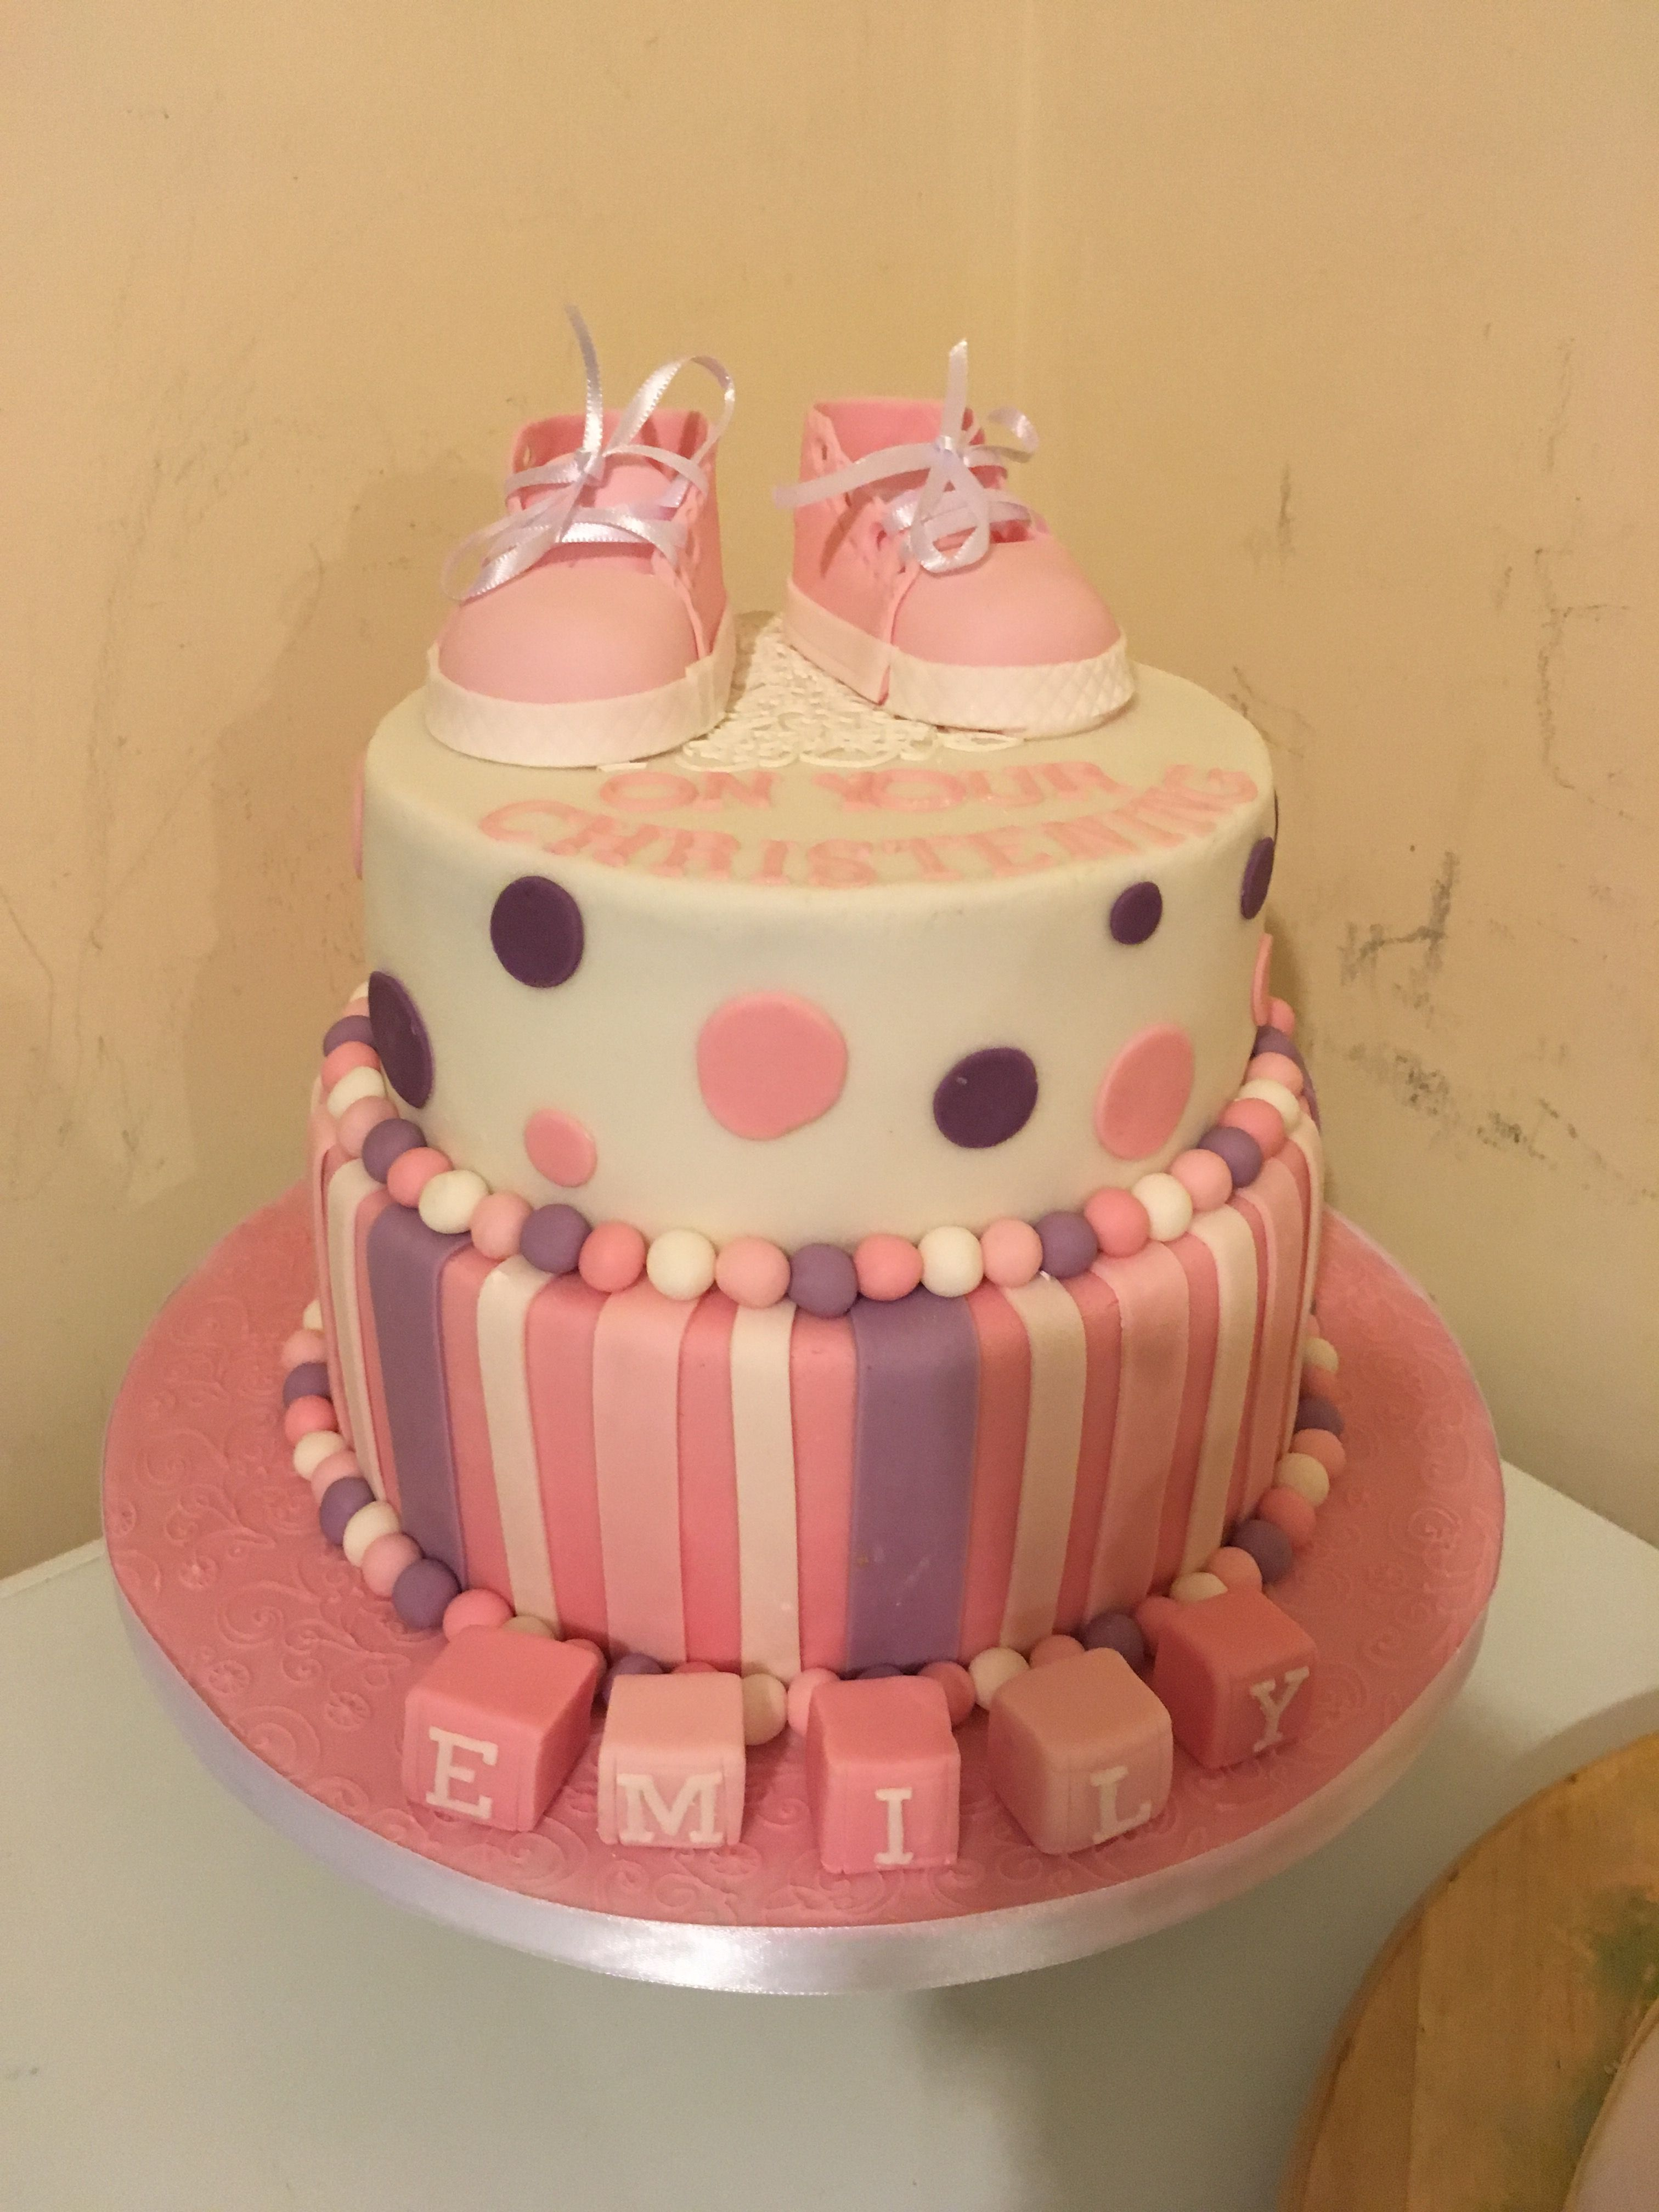 Christening cake, baby girl